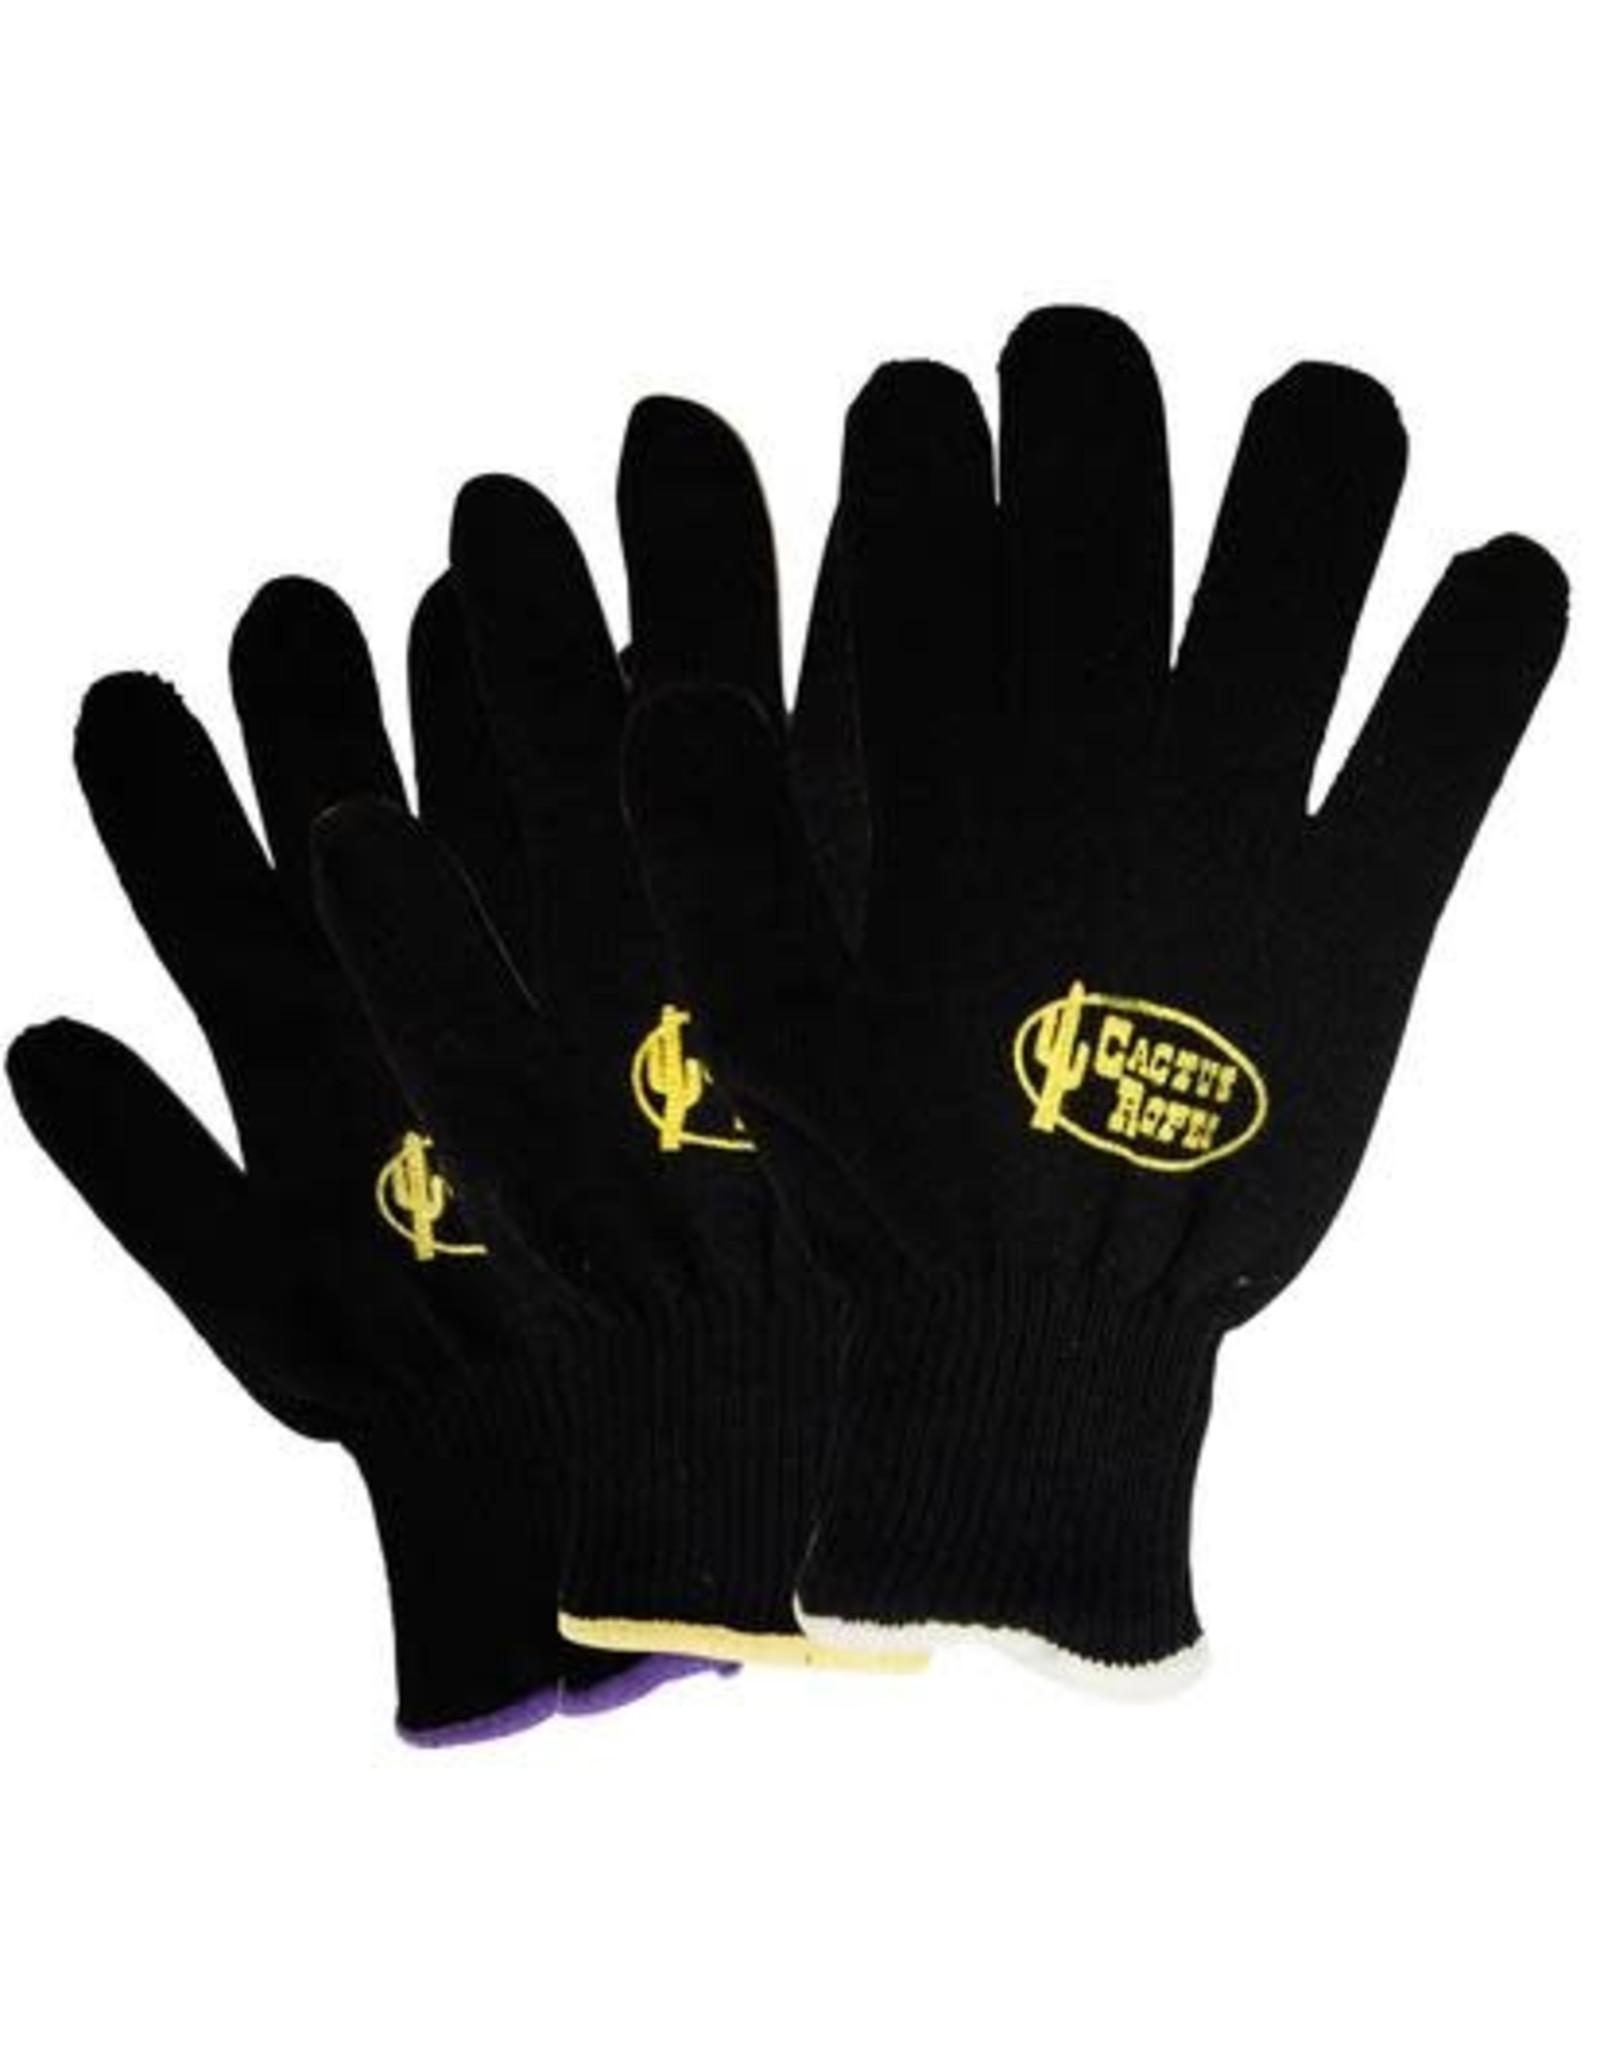 Black Cactus Roping Glove Med